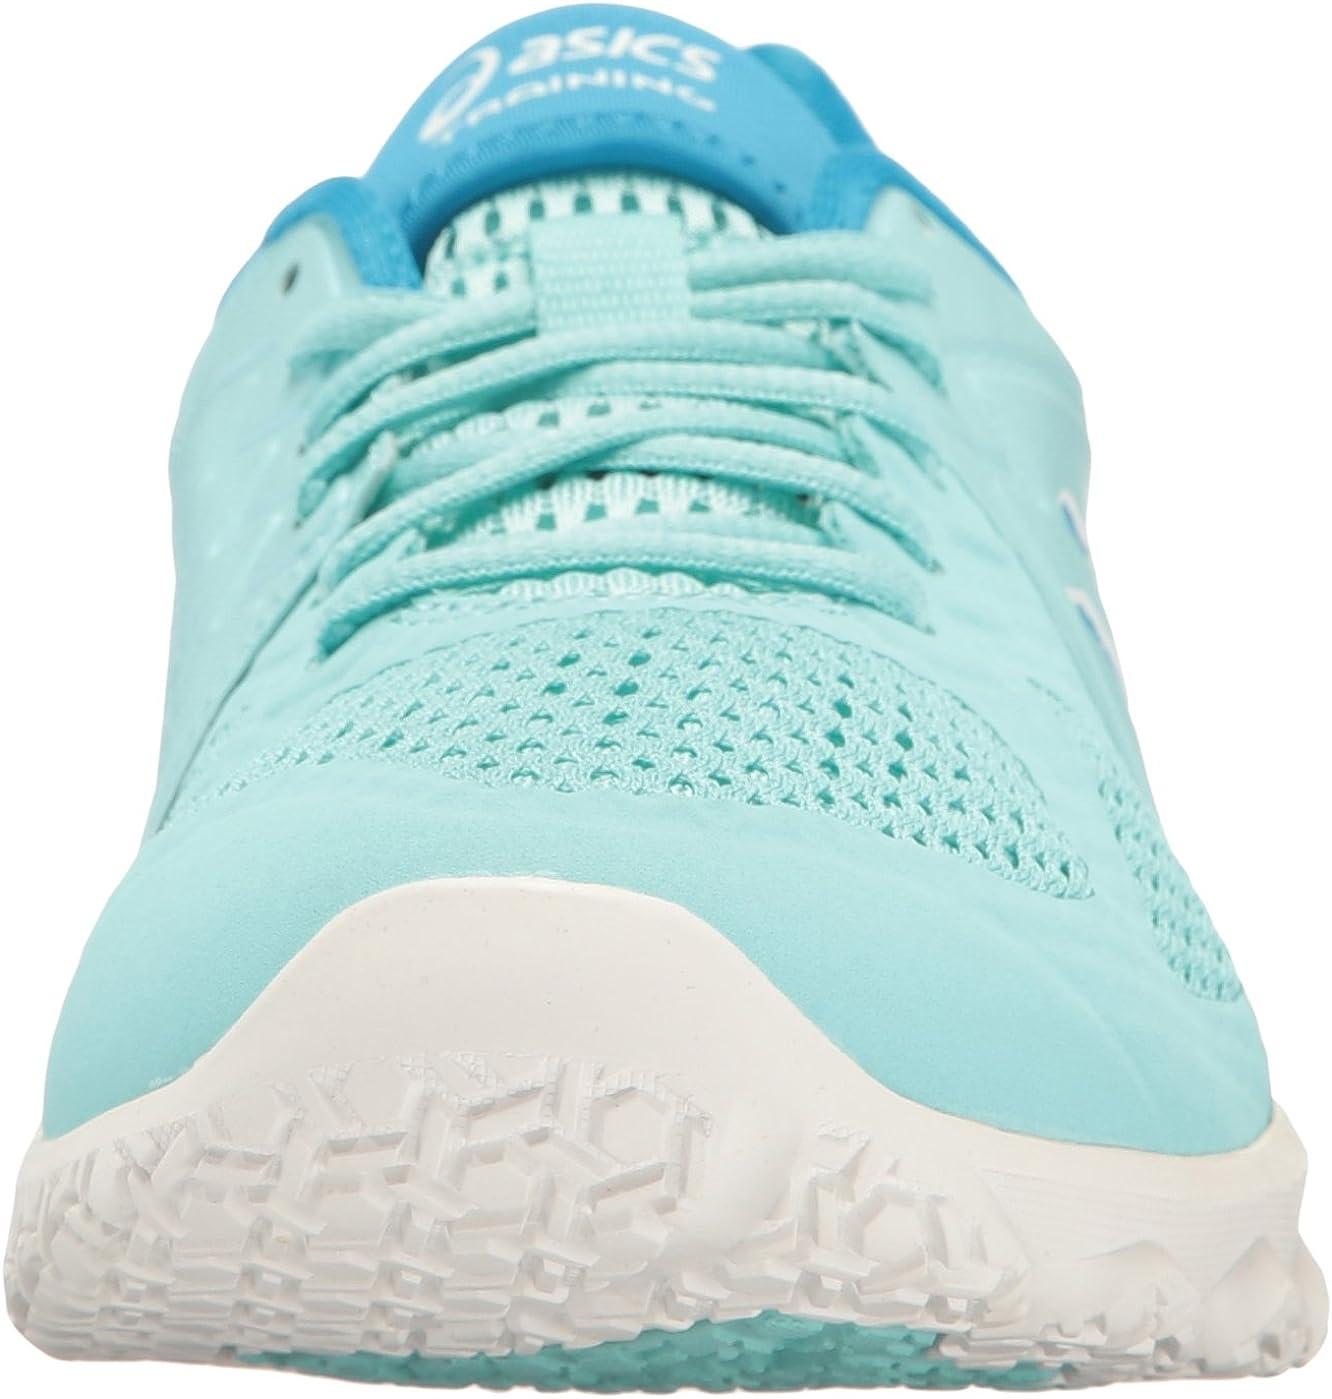 ASICS Women's Conviction X Cross-Trainer Shoe